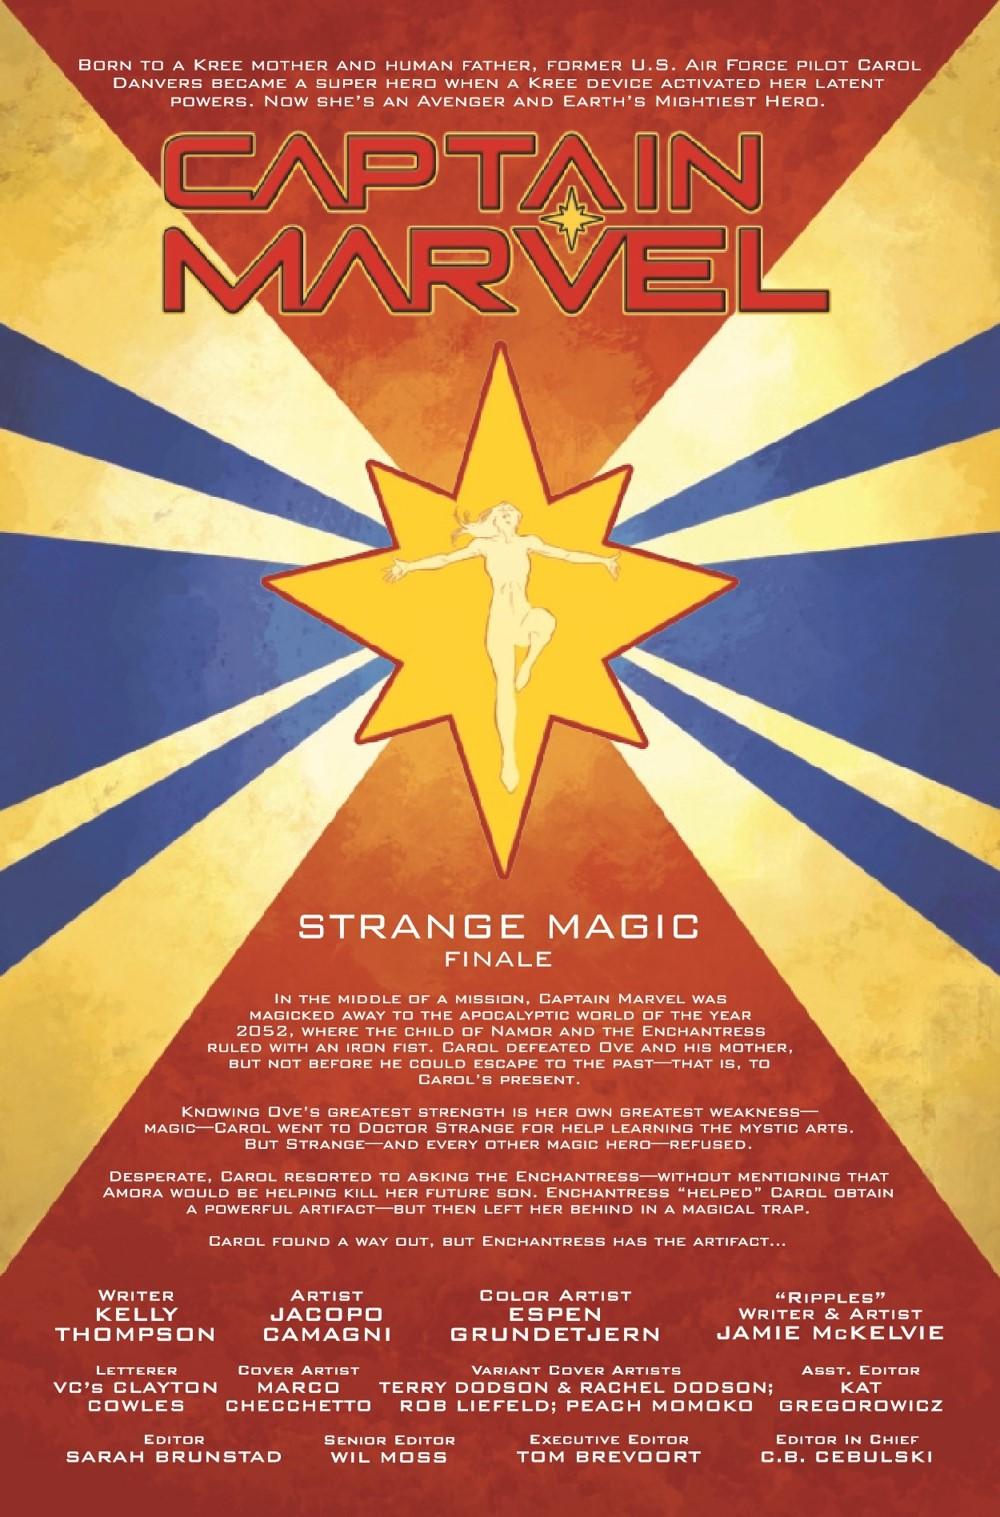 CAPMARV2019030_Preview-2 ComicList Previews: CAPTAIN MARVEL #30